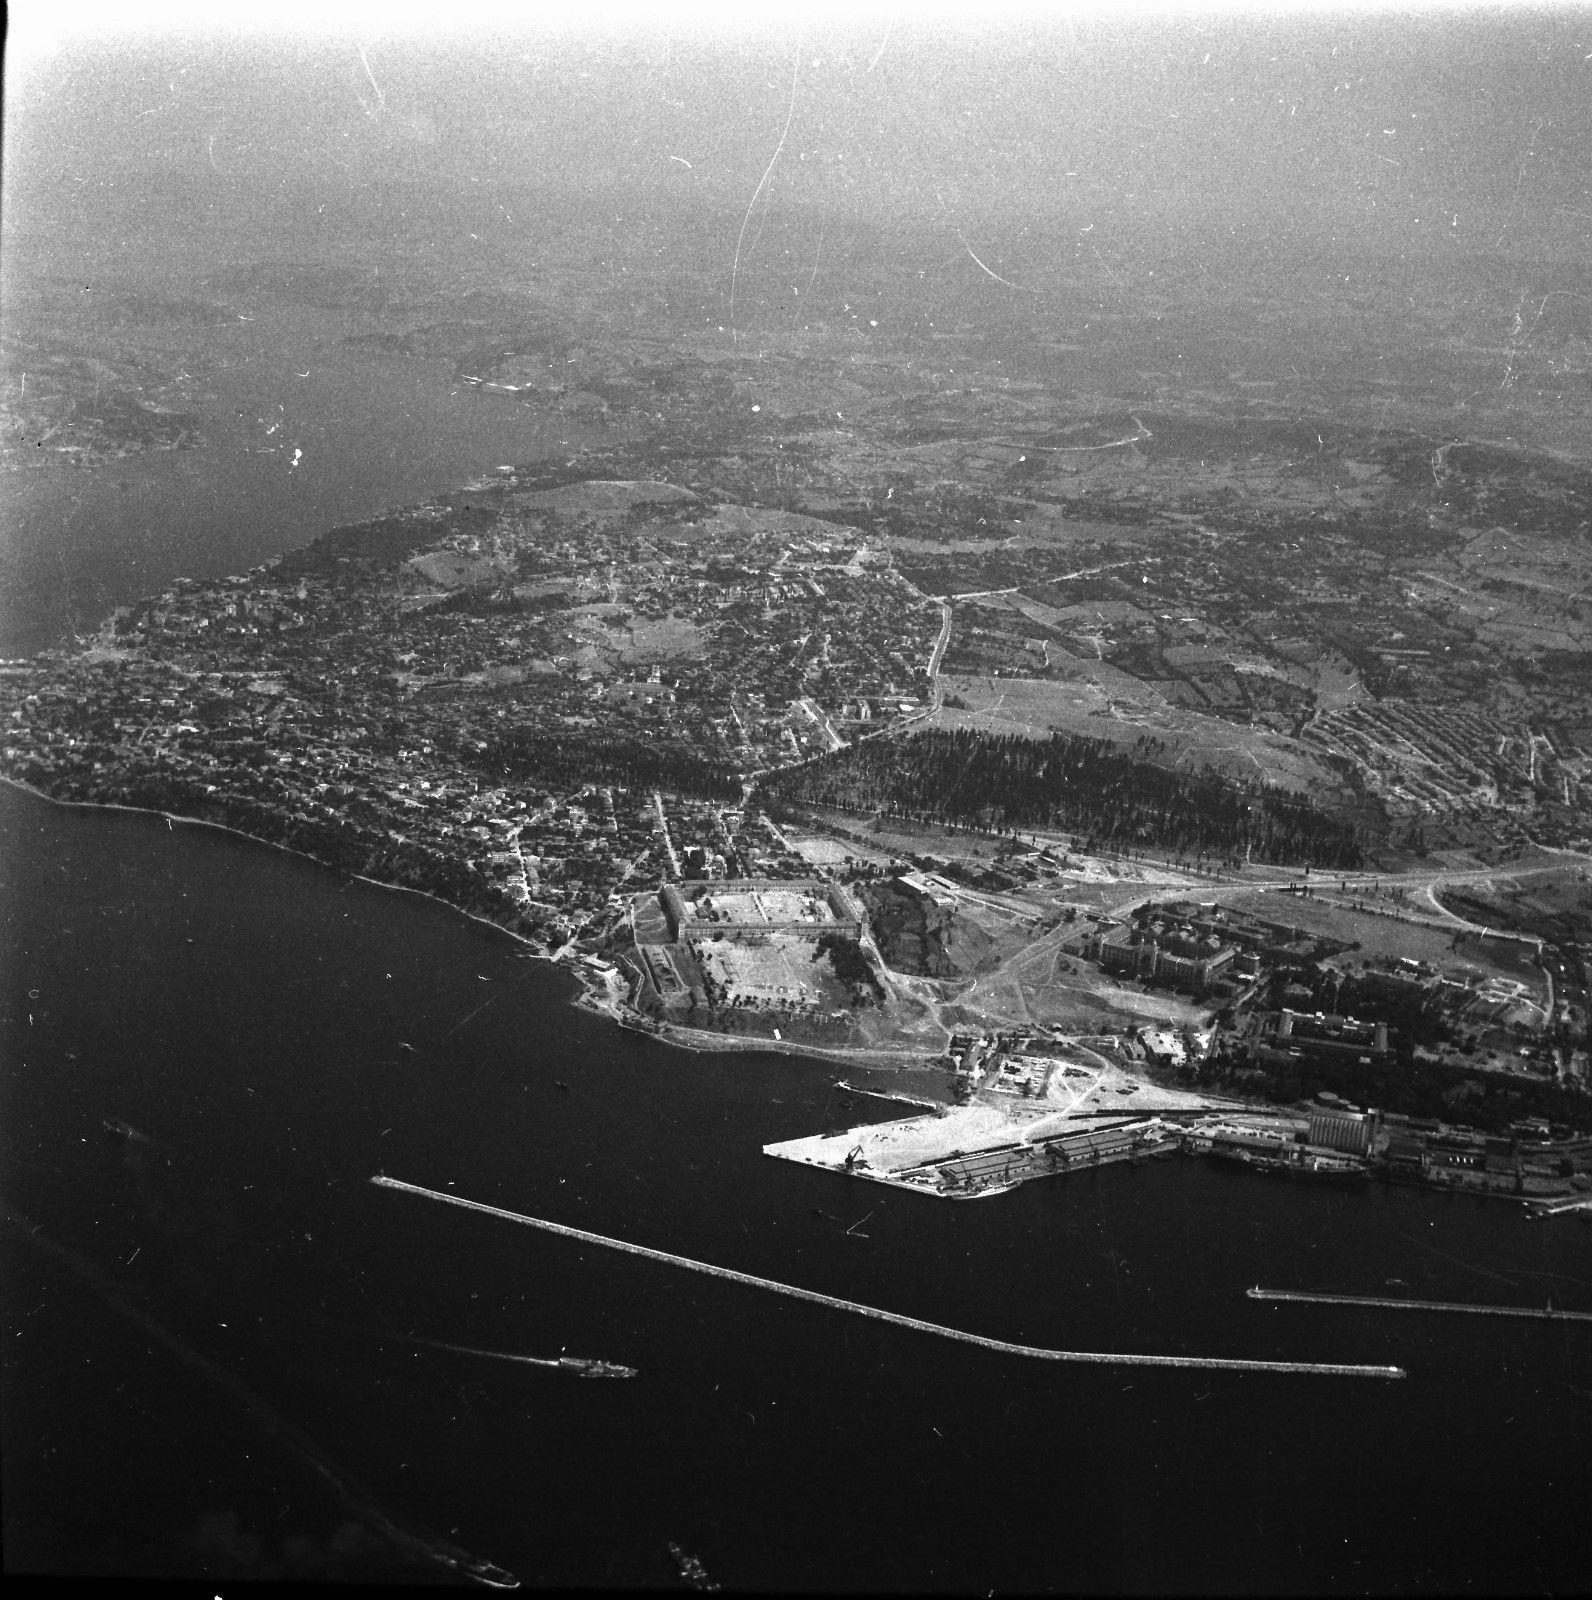 Панорама города с воздуха